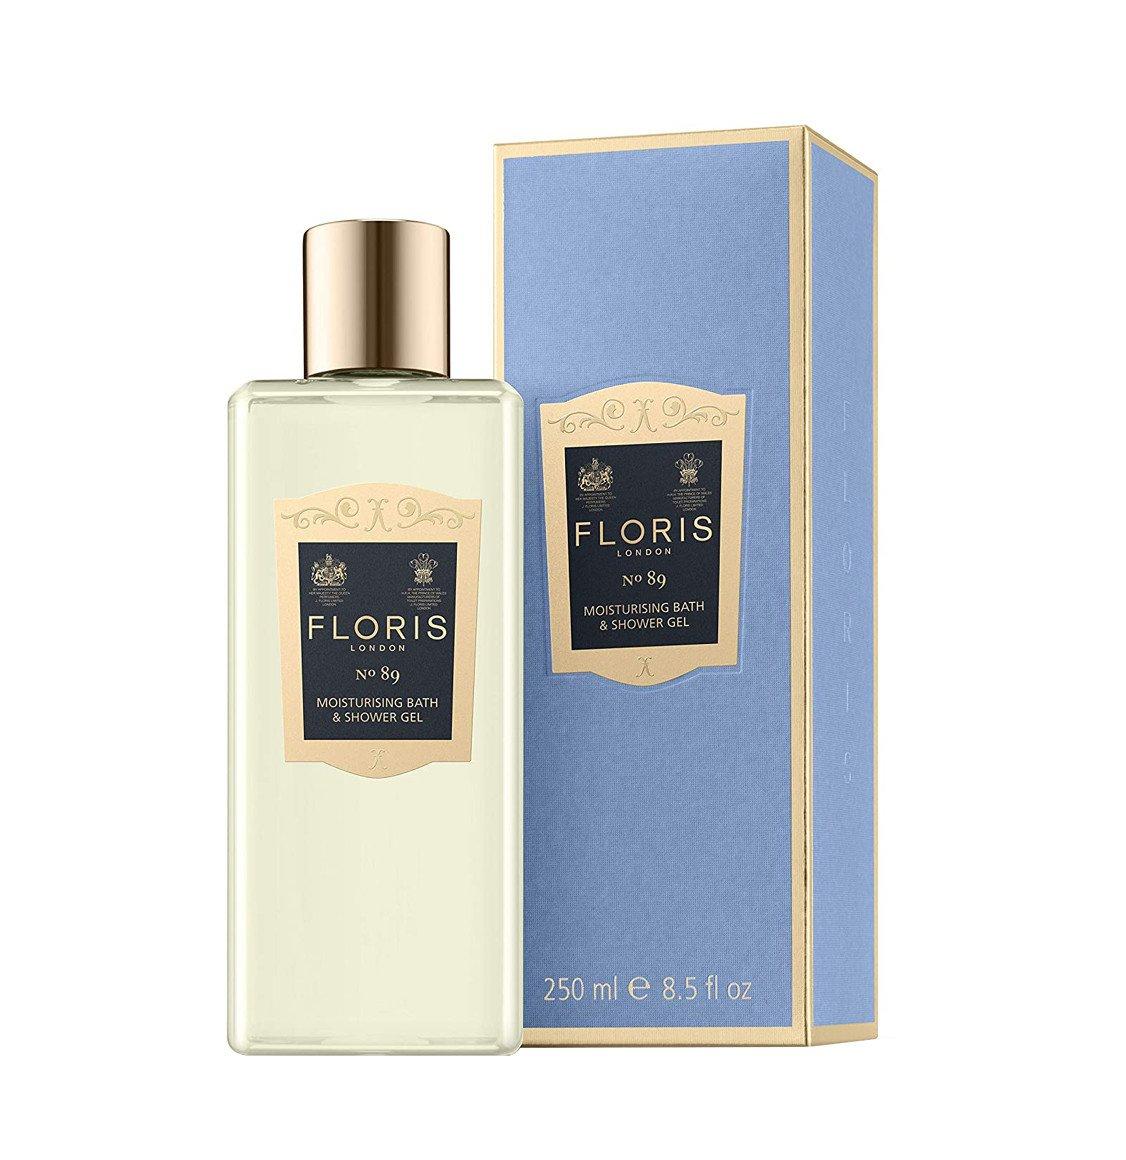 Floris London No. 89 Moisturising Bath And Shower Gel 250ml